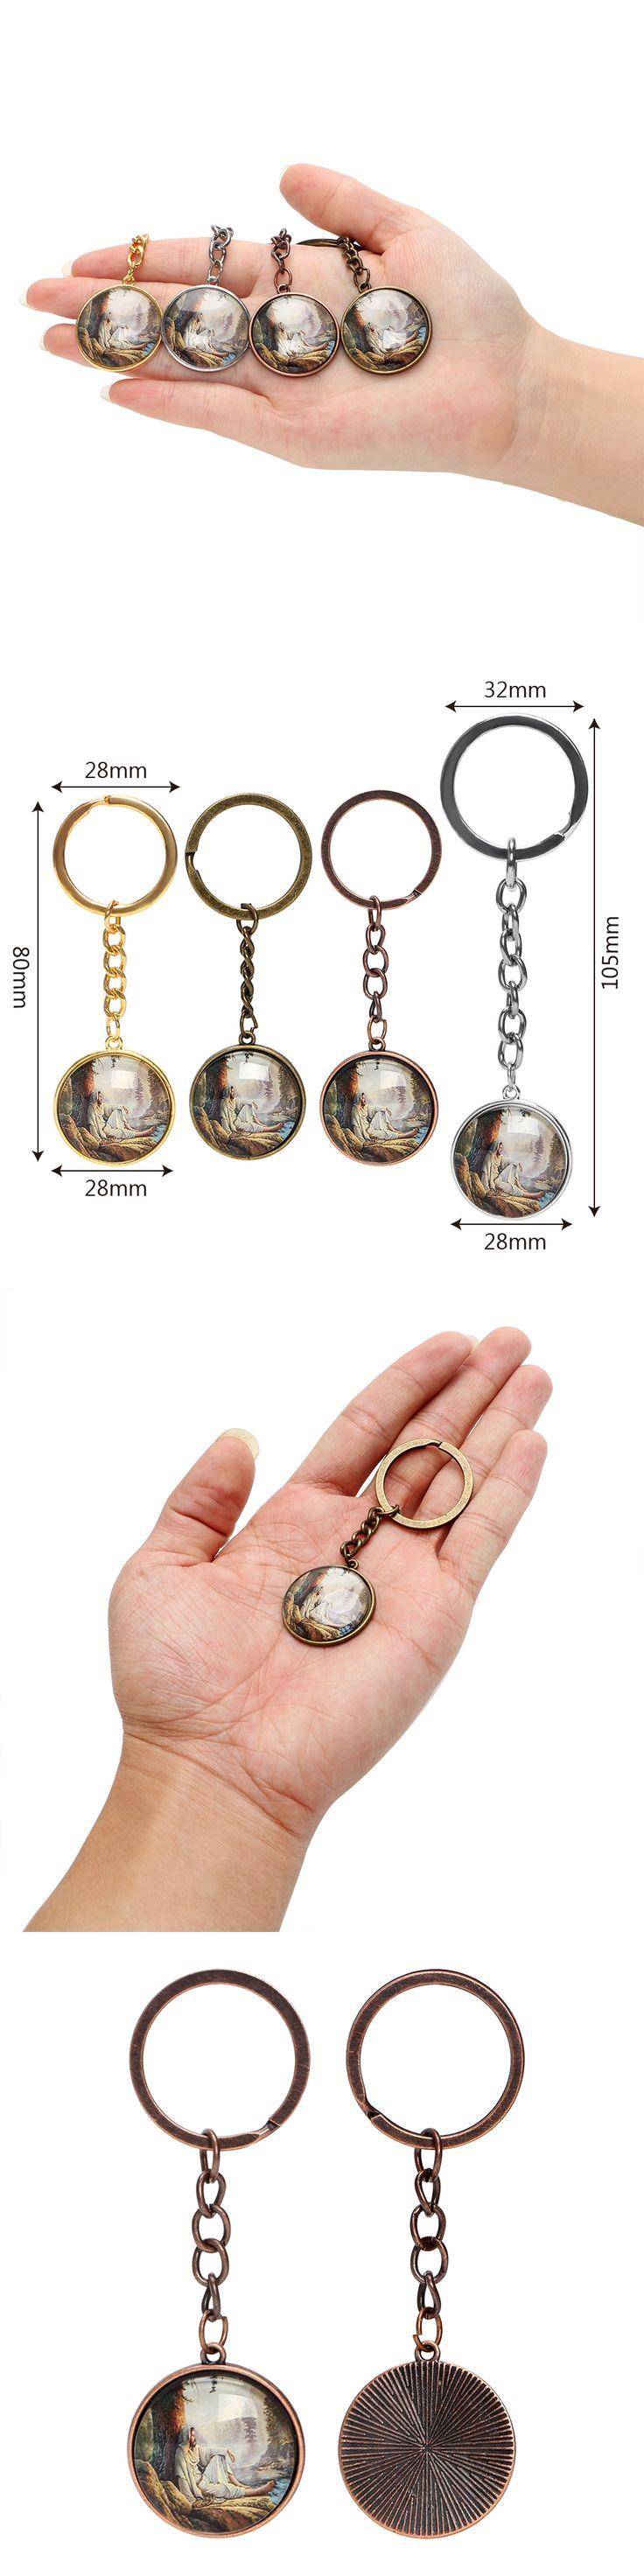 Jesus Christ Keyring Keychain Top Quality Car Key Chain Creative Pendant Alloy Key Fob Car Styling Auto Key Ring Decoration